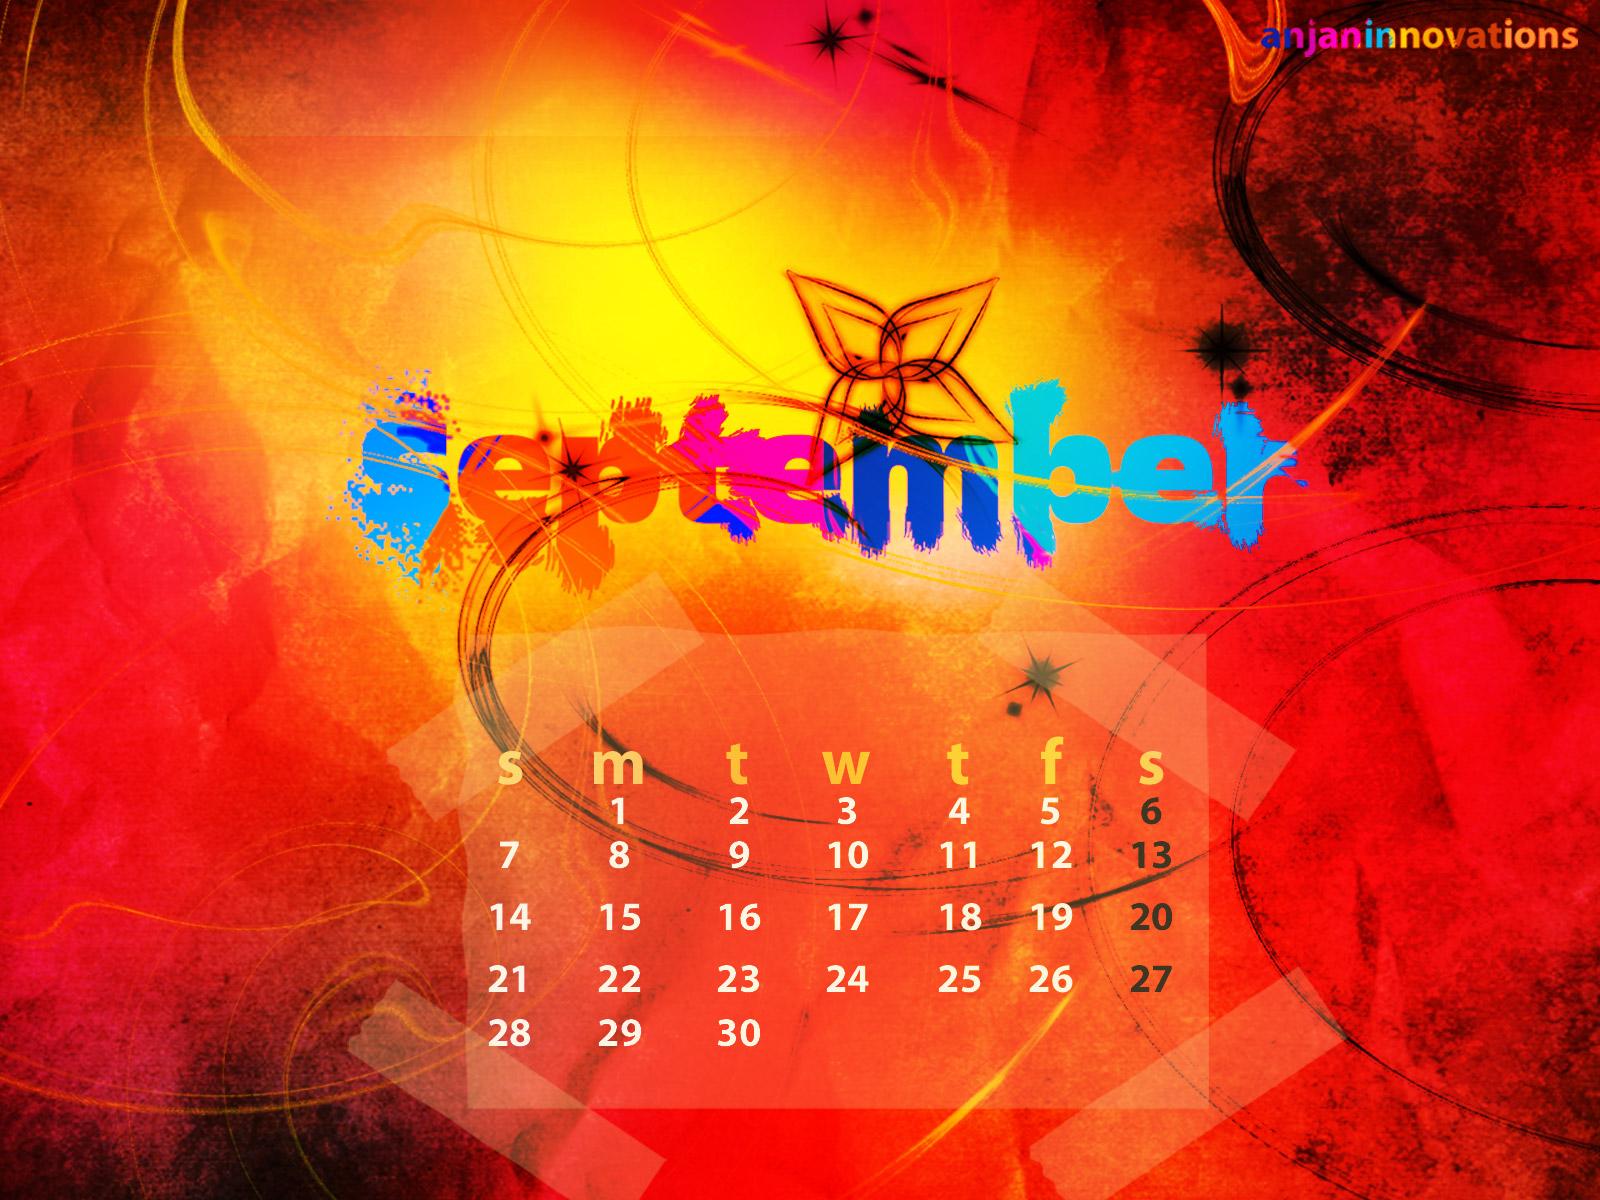 September Desktop Wallpaper Anjheros Weblog 1600x1200